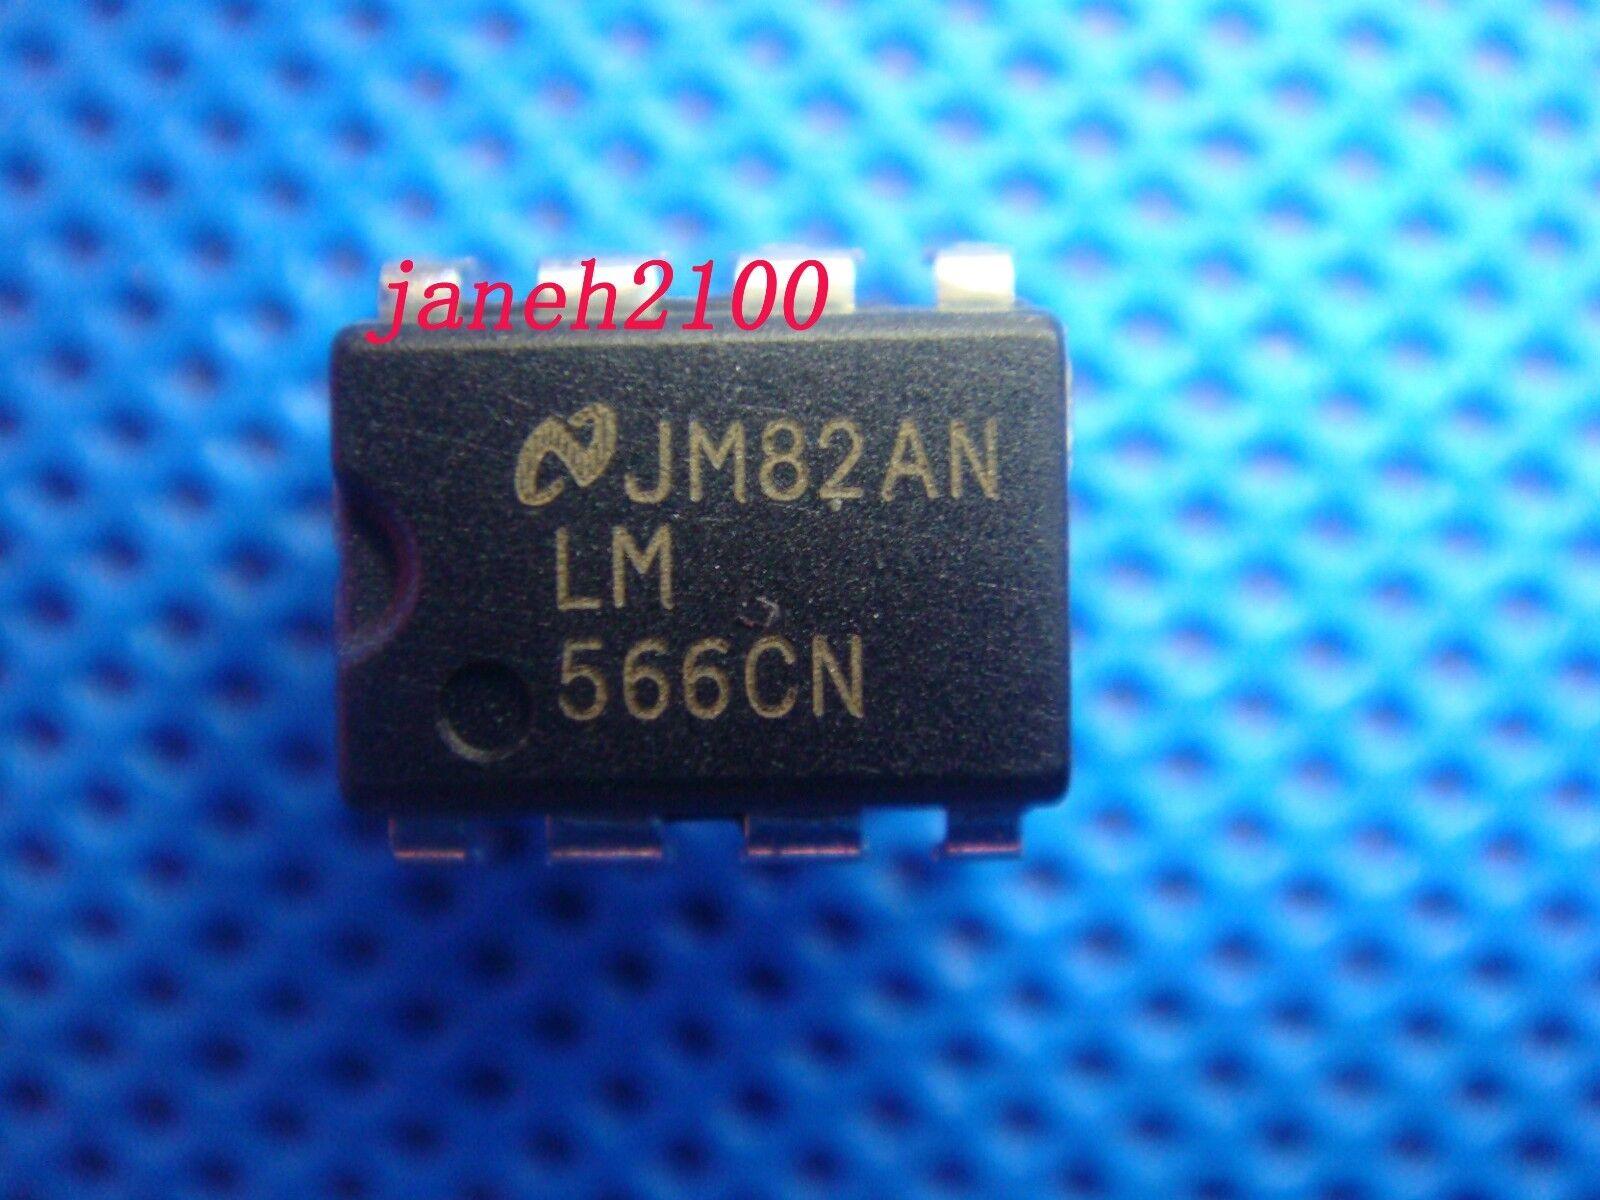 5pcs Ic Nsc Dip 8 Lm566cn Good Quality Ar1 Ebay Ne555 Ne555p 555 Timers New High Integrated Circuit Brand Lowest Price